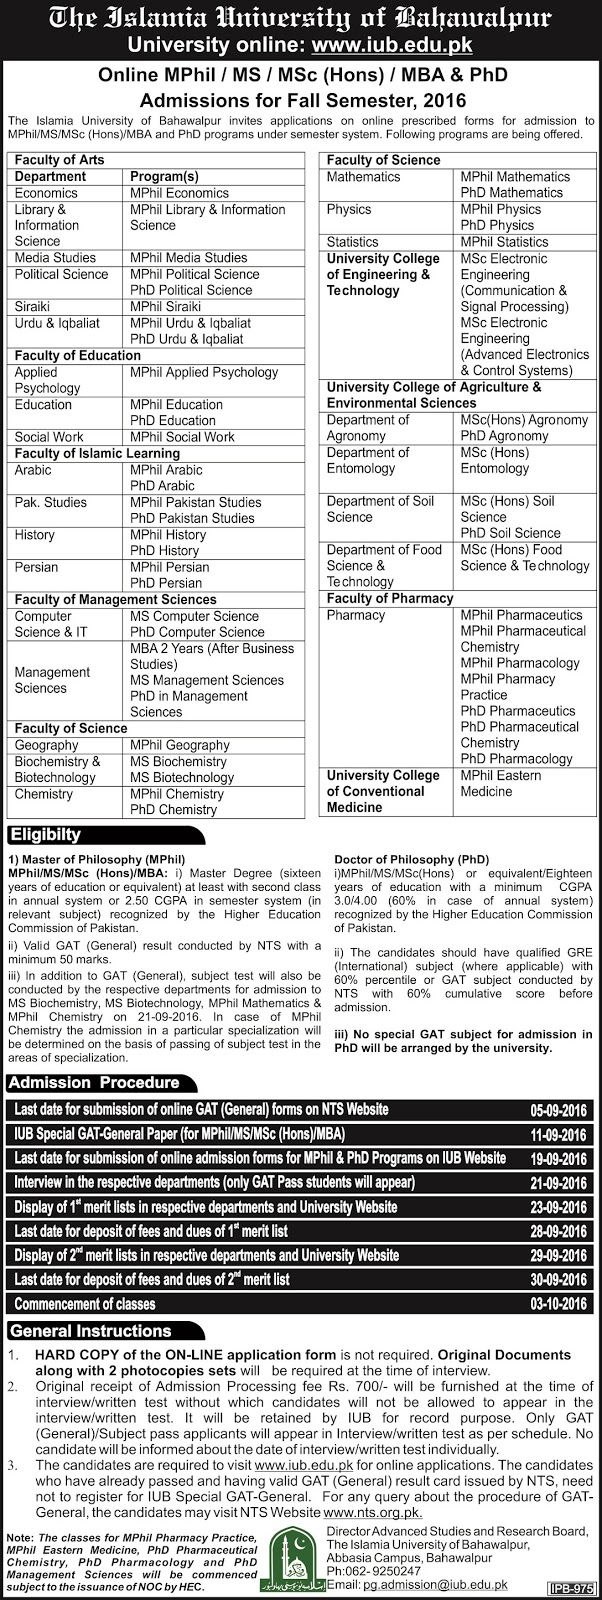 IUB (Islamia University of Bahawalpur) Fall Admissions 2016